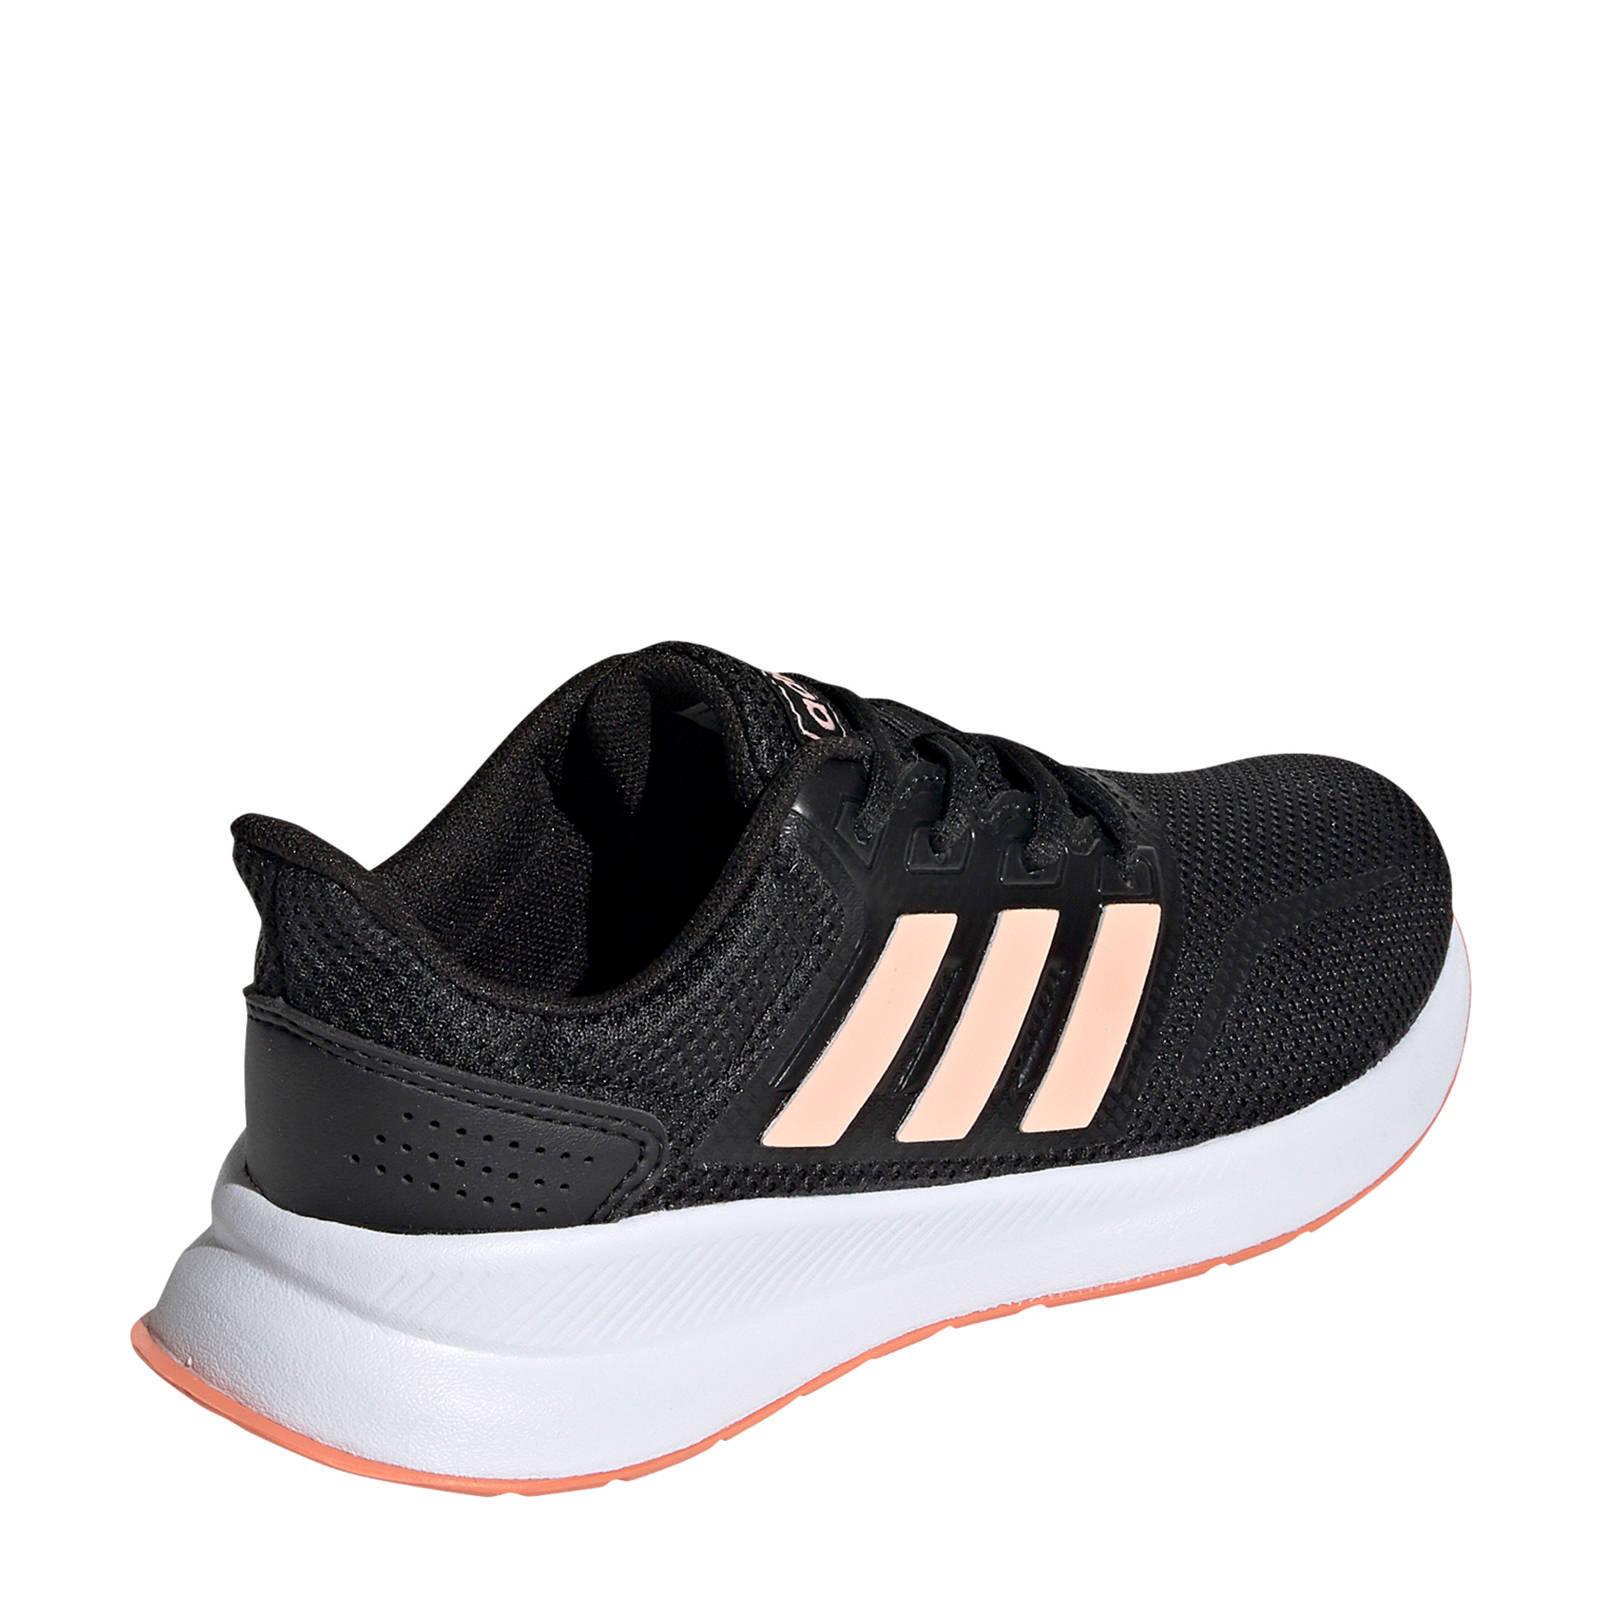 adidas Performance Runfalcon hardloopschoenen zwartroze